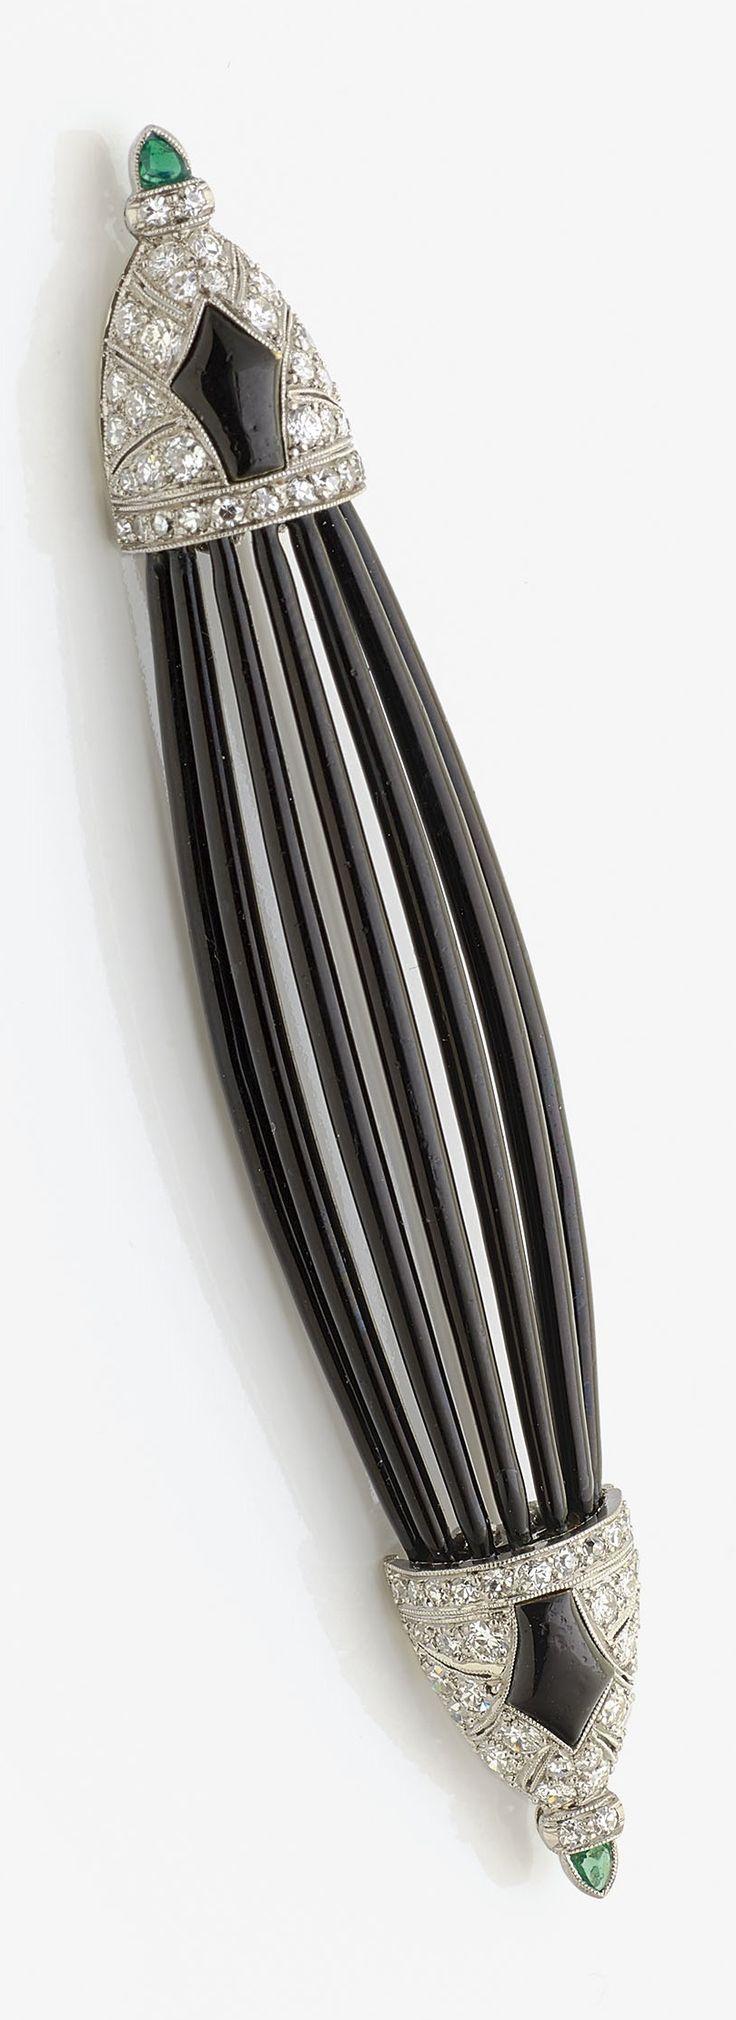 AN ART DECO PLATINUM, ENAMEL, DIAMOND AND EMERALD BROOCH, ENGLISH, ABOUT 1925. Measurements: 8.4 x 1.5 - 2.7 cm. #ArtDeco